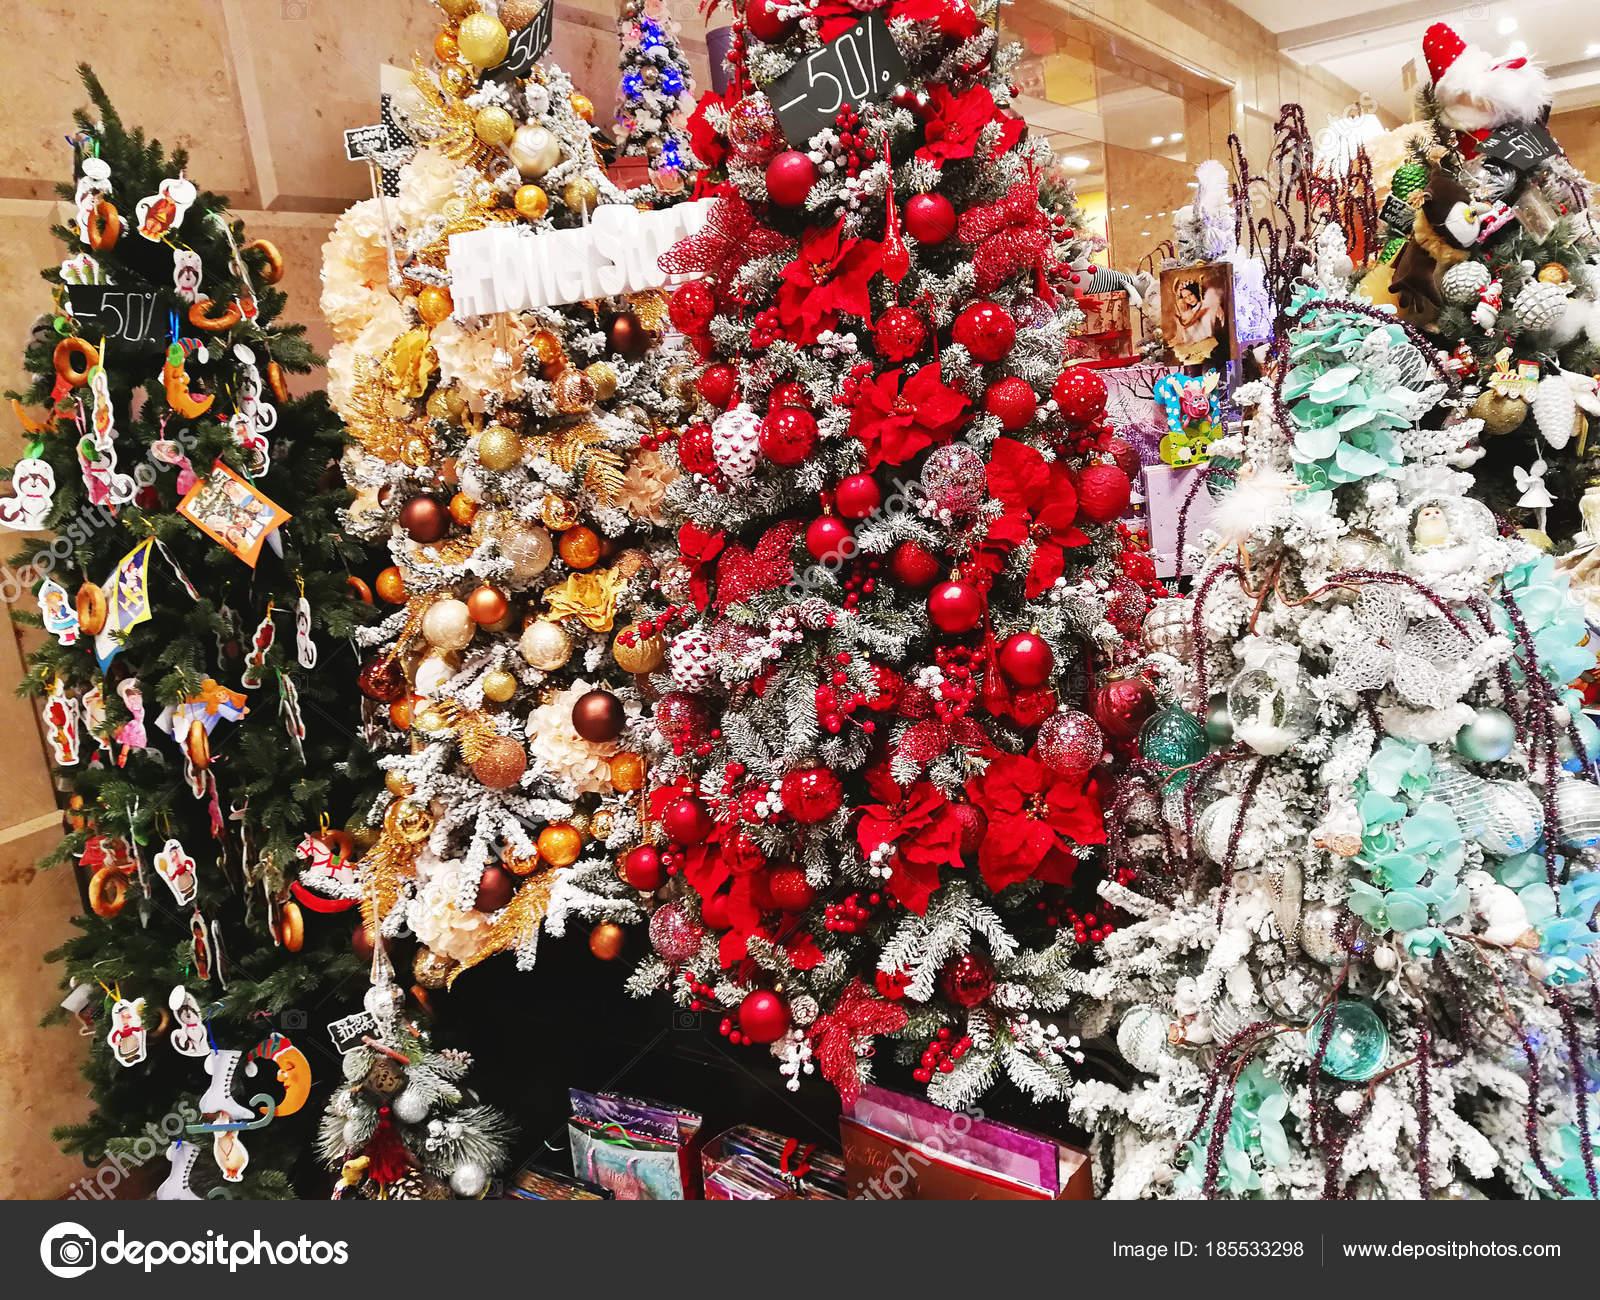 Immagini Di Alberi Di Natale Decorati.Multicolori Alberi Di Natale Decorati Con Palline Fiori E T